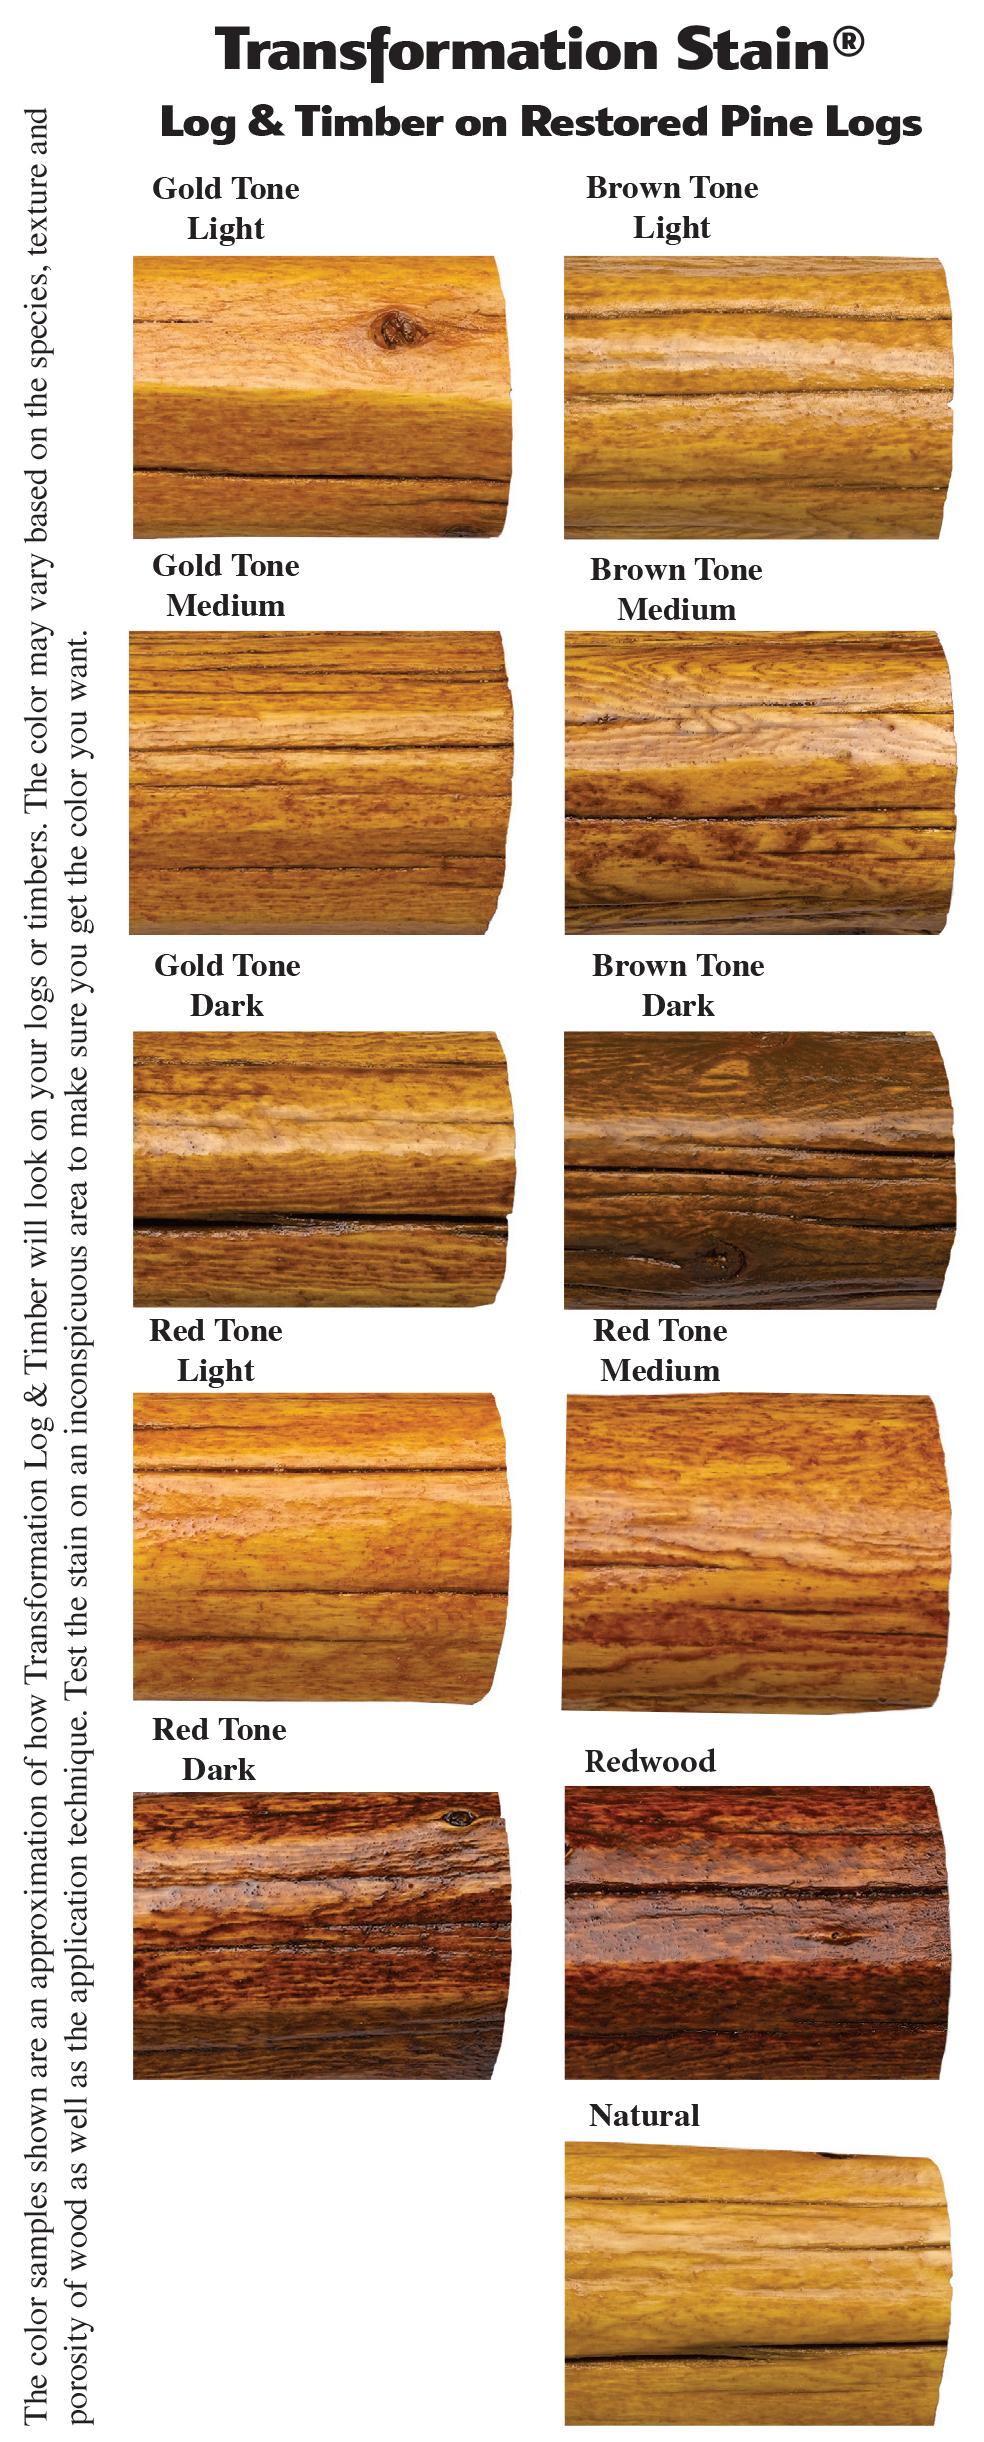 trs-color-chart.jpg